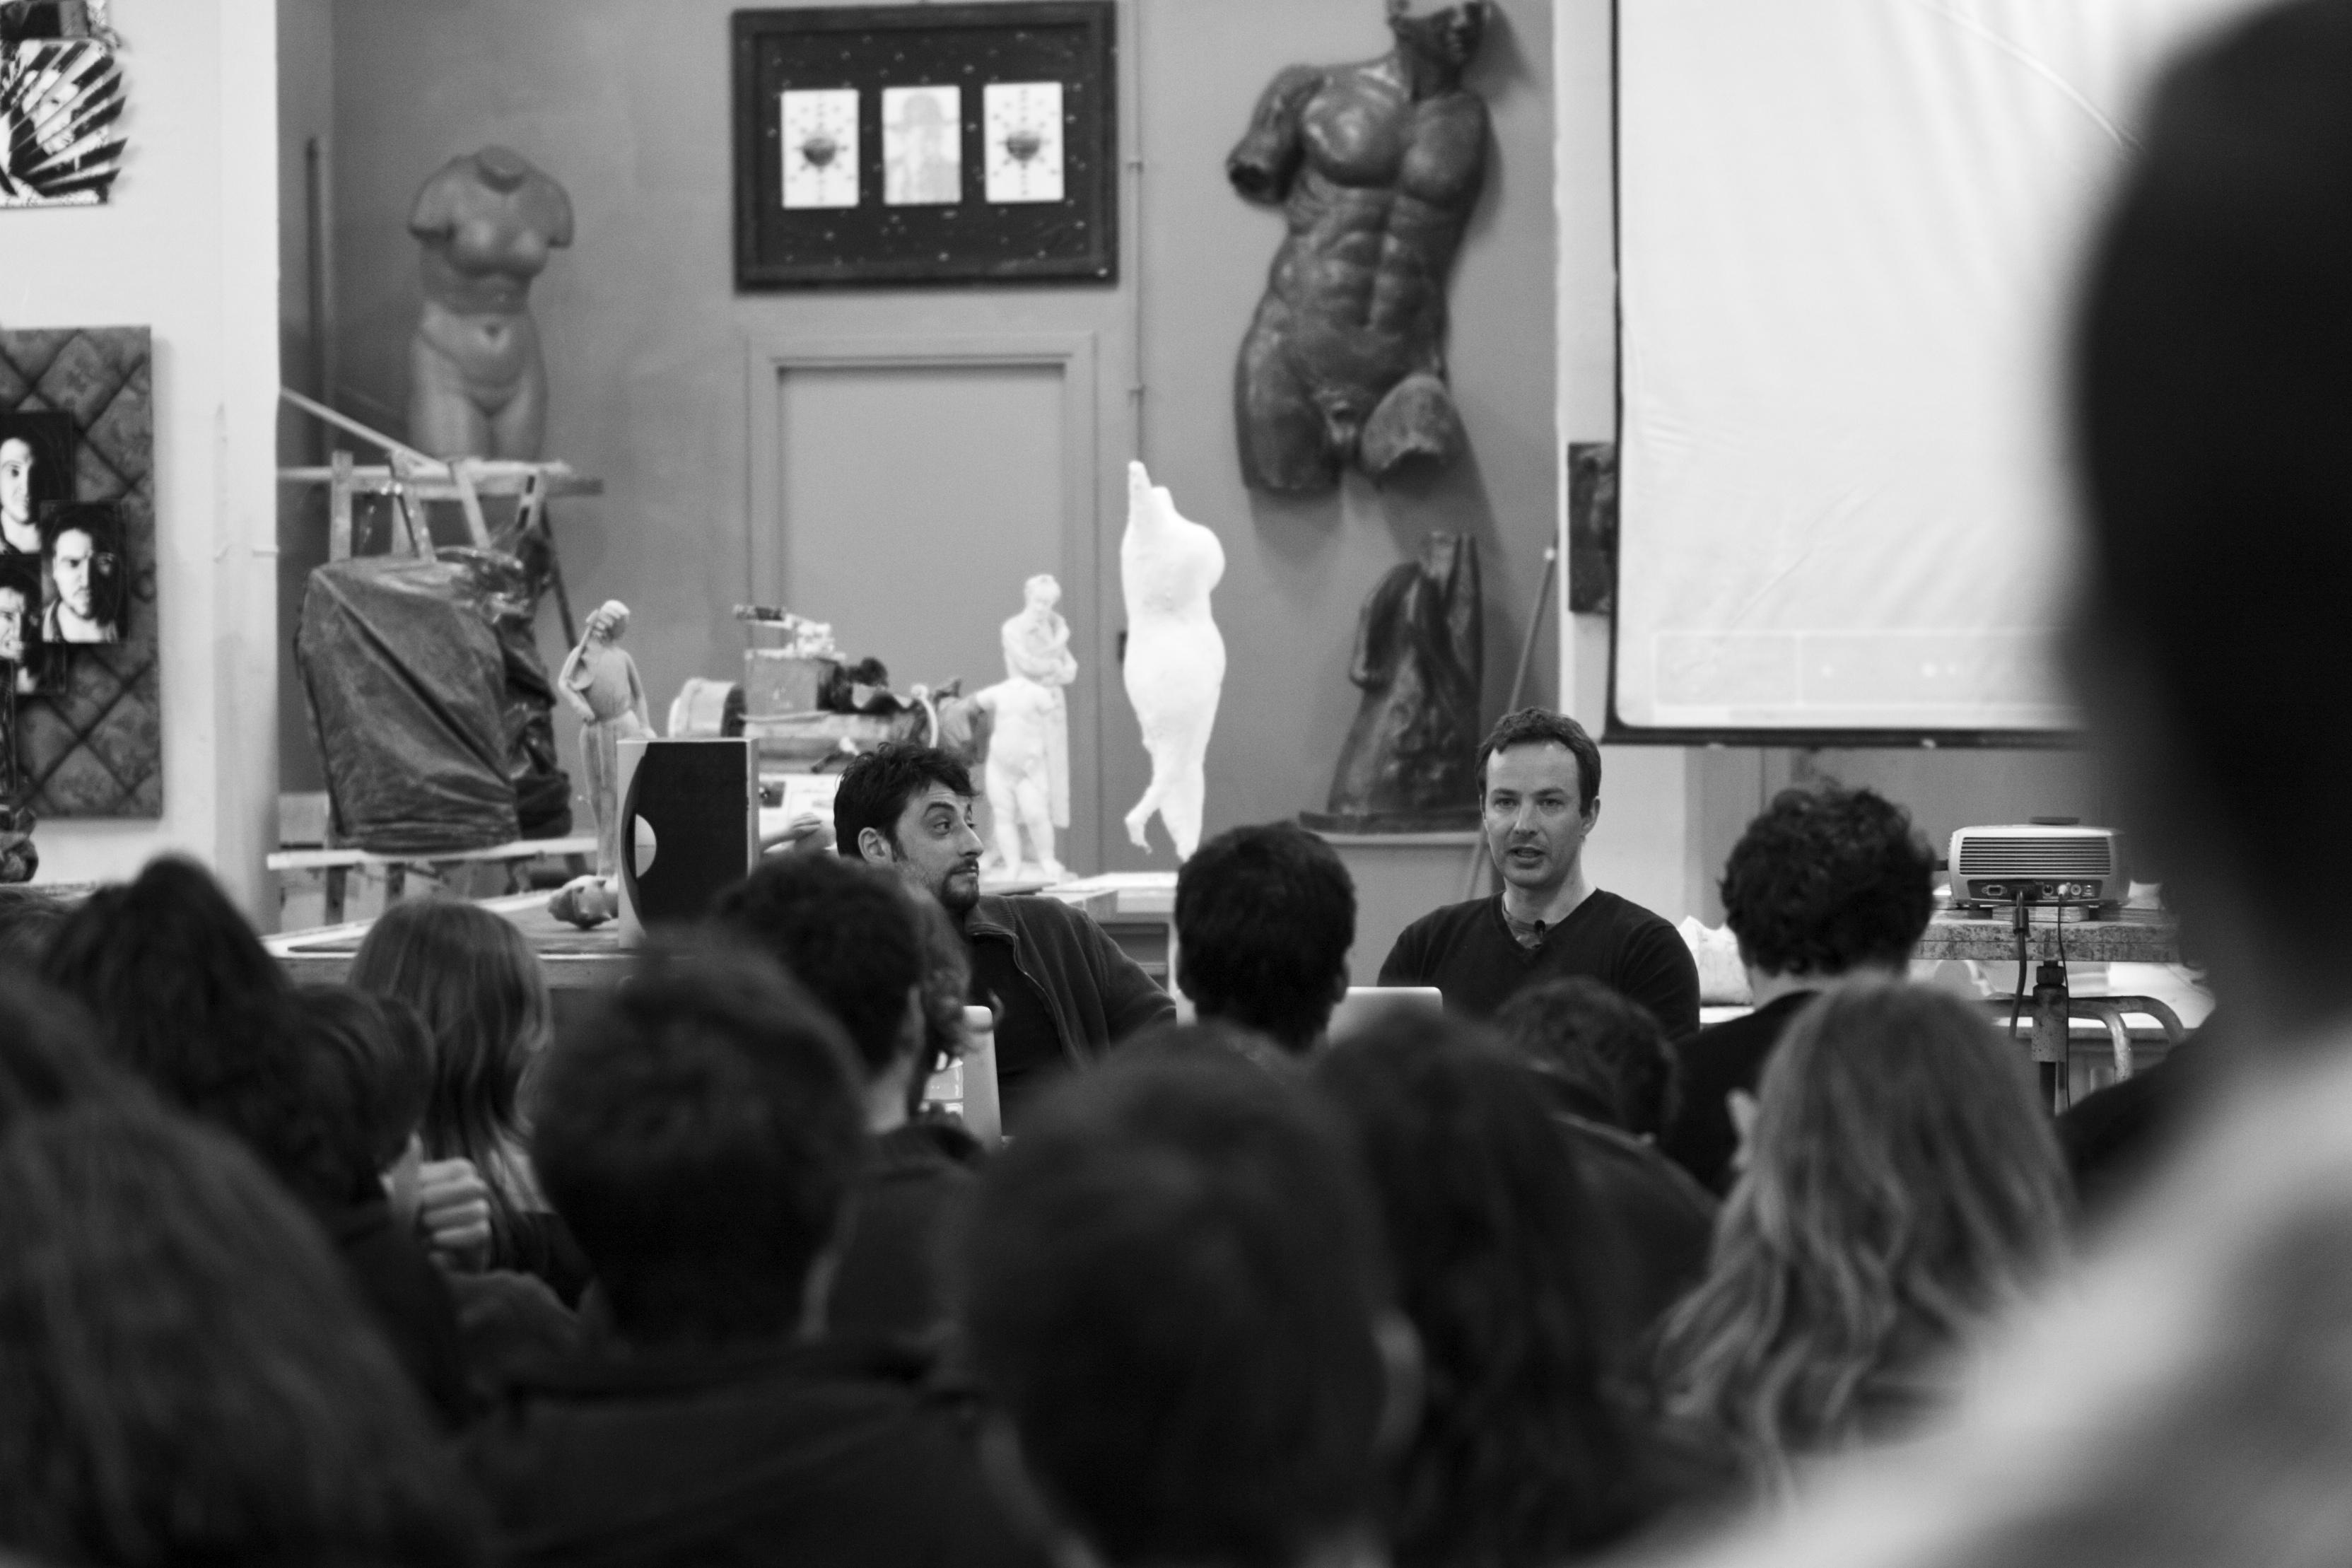 Flickr - Aron Demetz - Dialoghi e materia - Workshop a cura di Franco Reina05